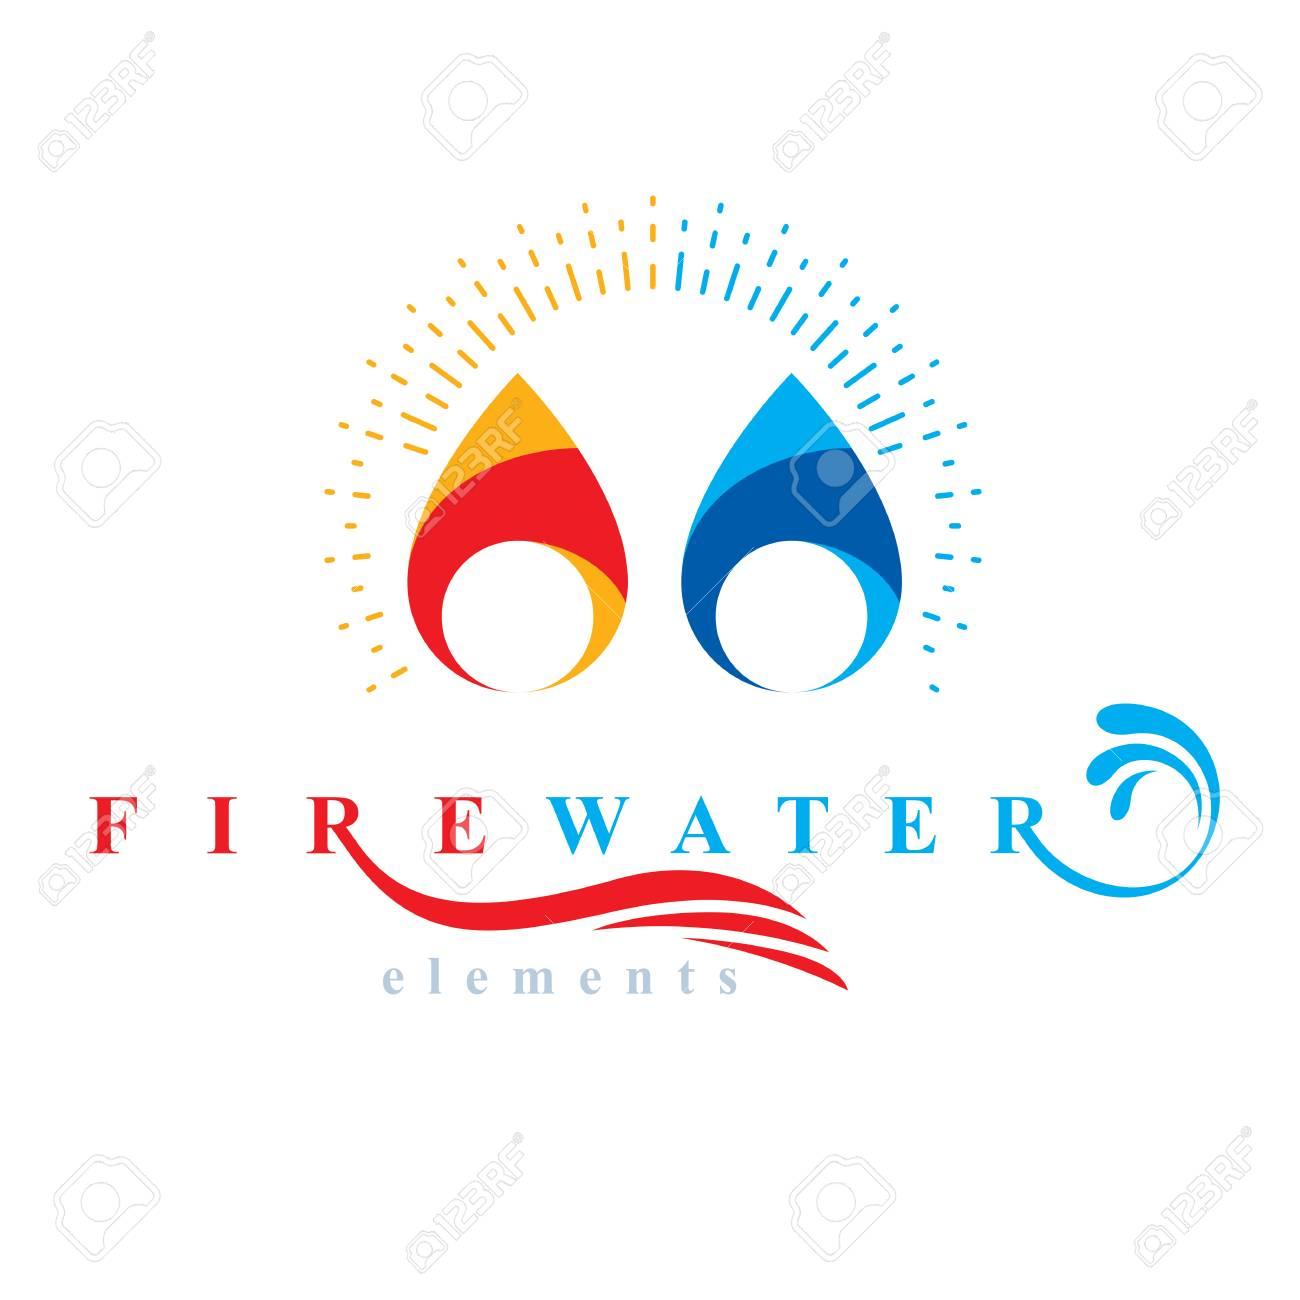 Nature Elements Balance Conceptual Emblem For Use As Marketing